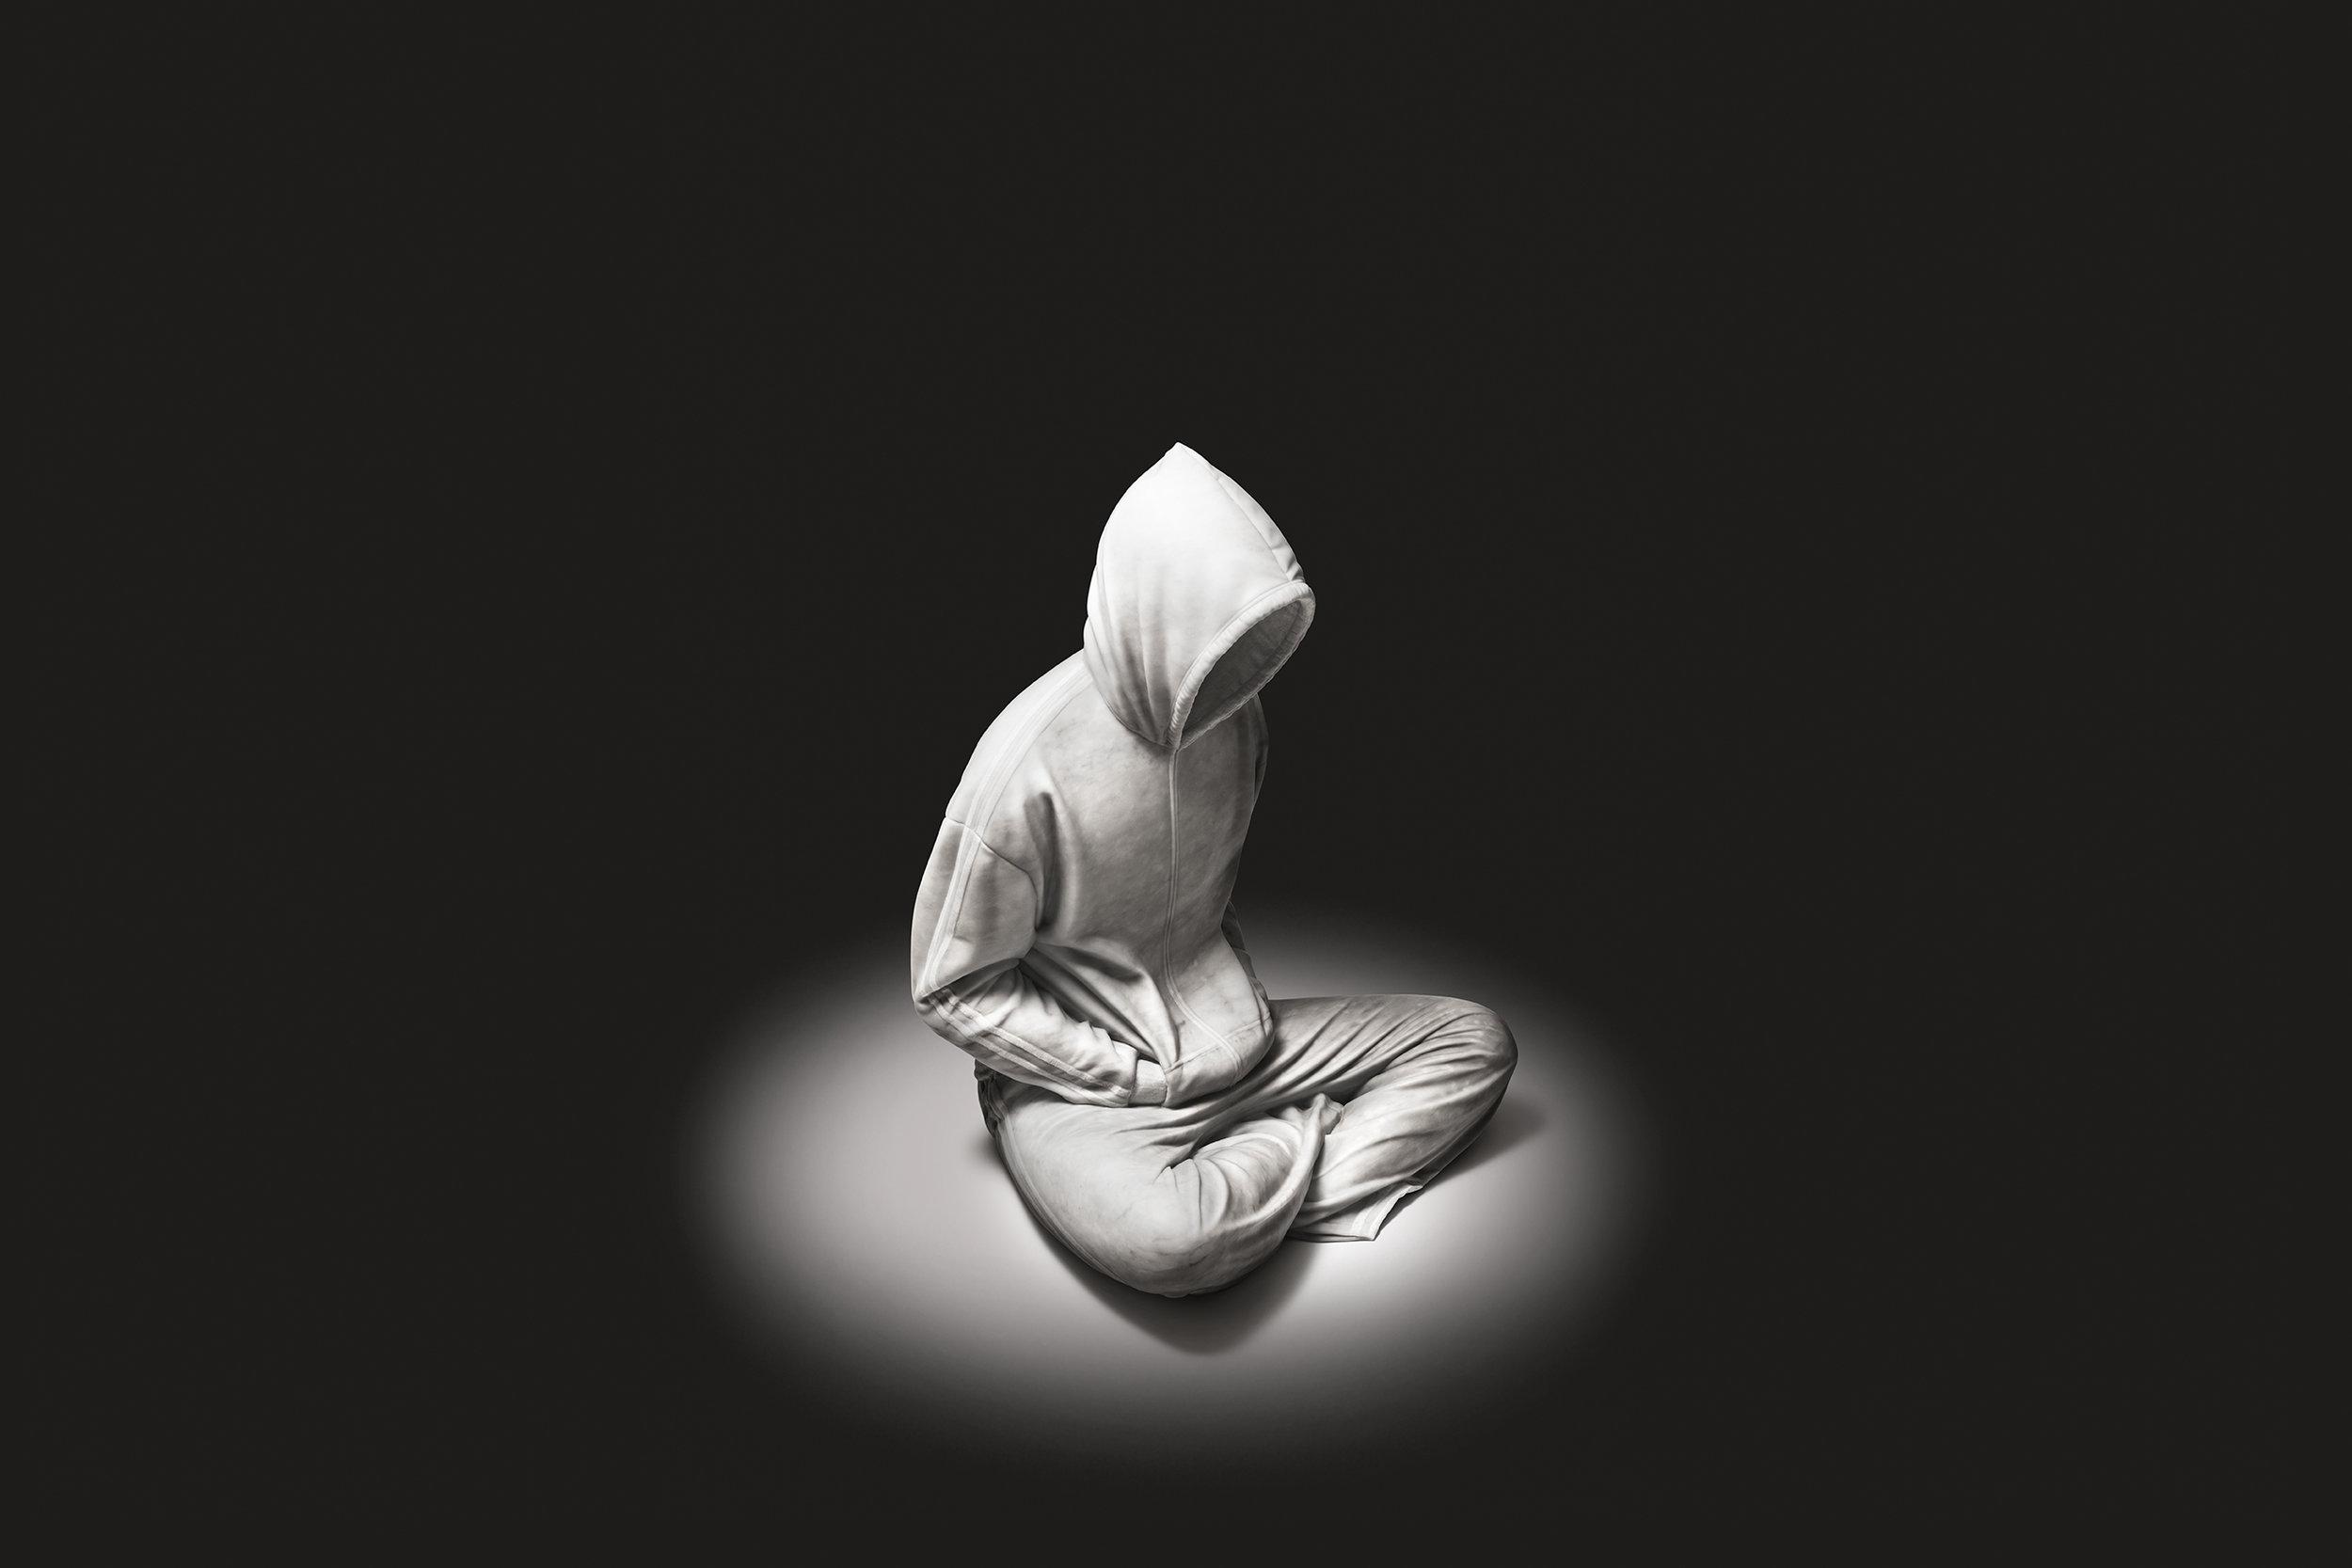 Soloist   2012 Bianco Carrara marble 95 x 75 x 70 cm